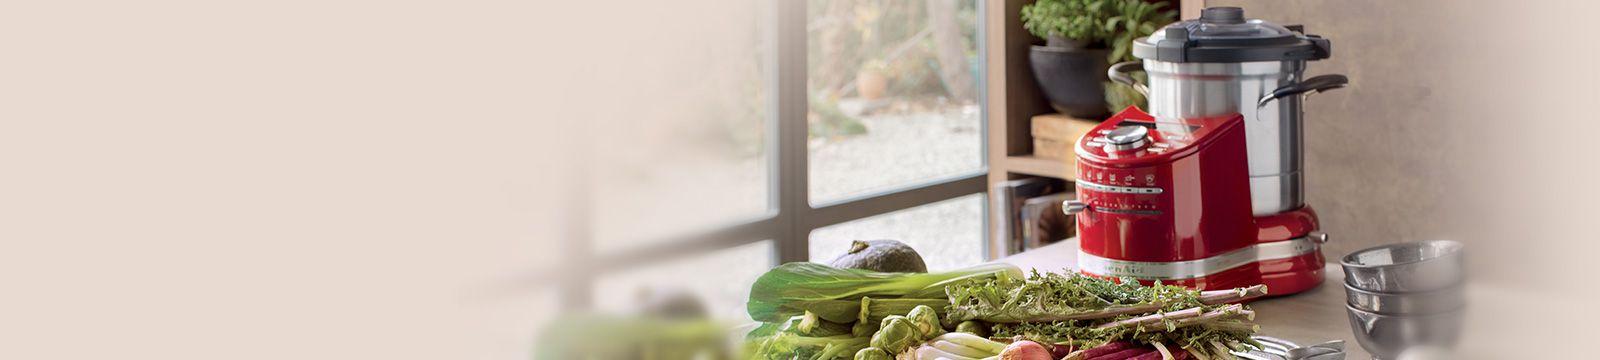 cook processor haushaltskleinger te offizielle website von kitchenaid. Black Bedroom Furniture Sets. Home Design Ideas